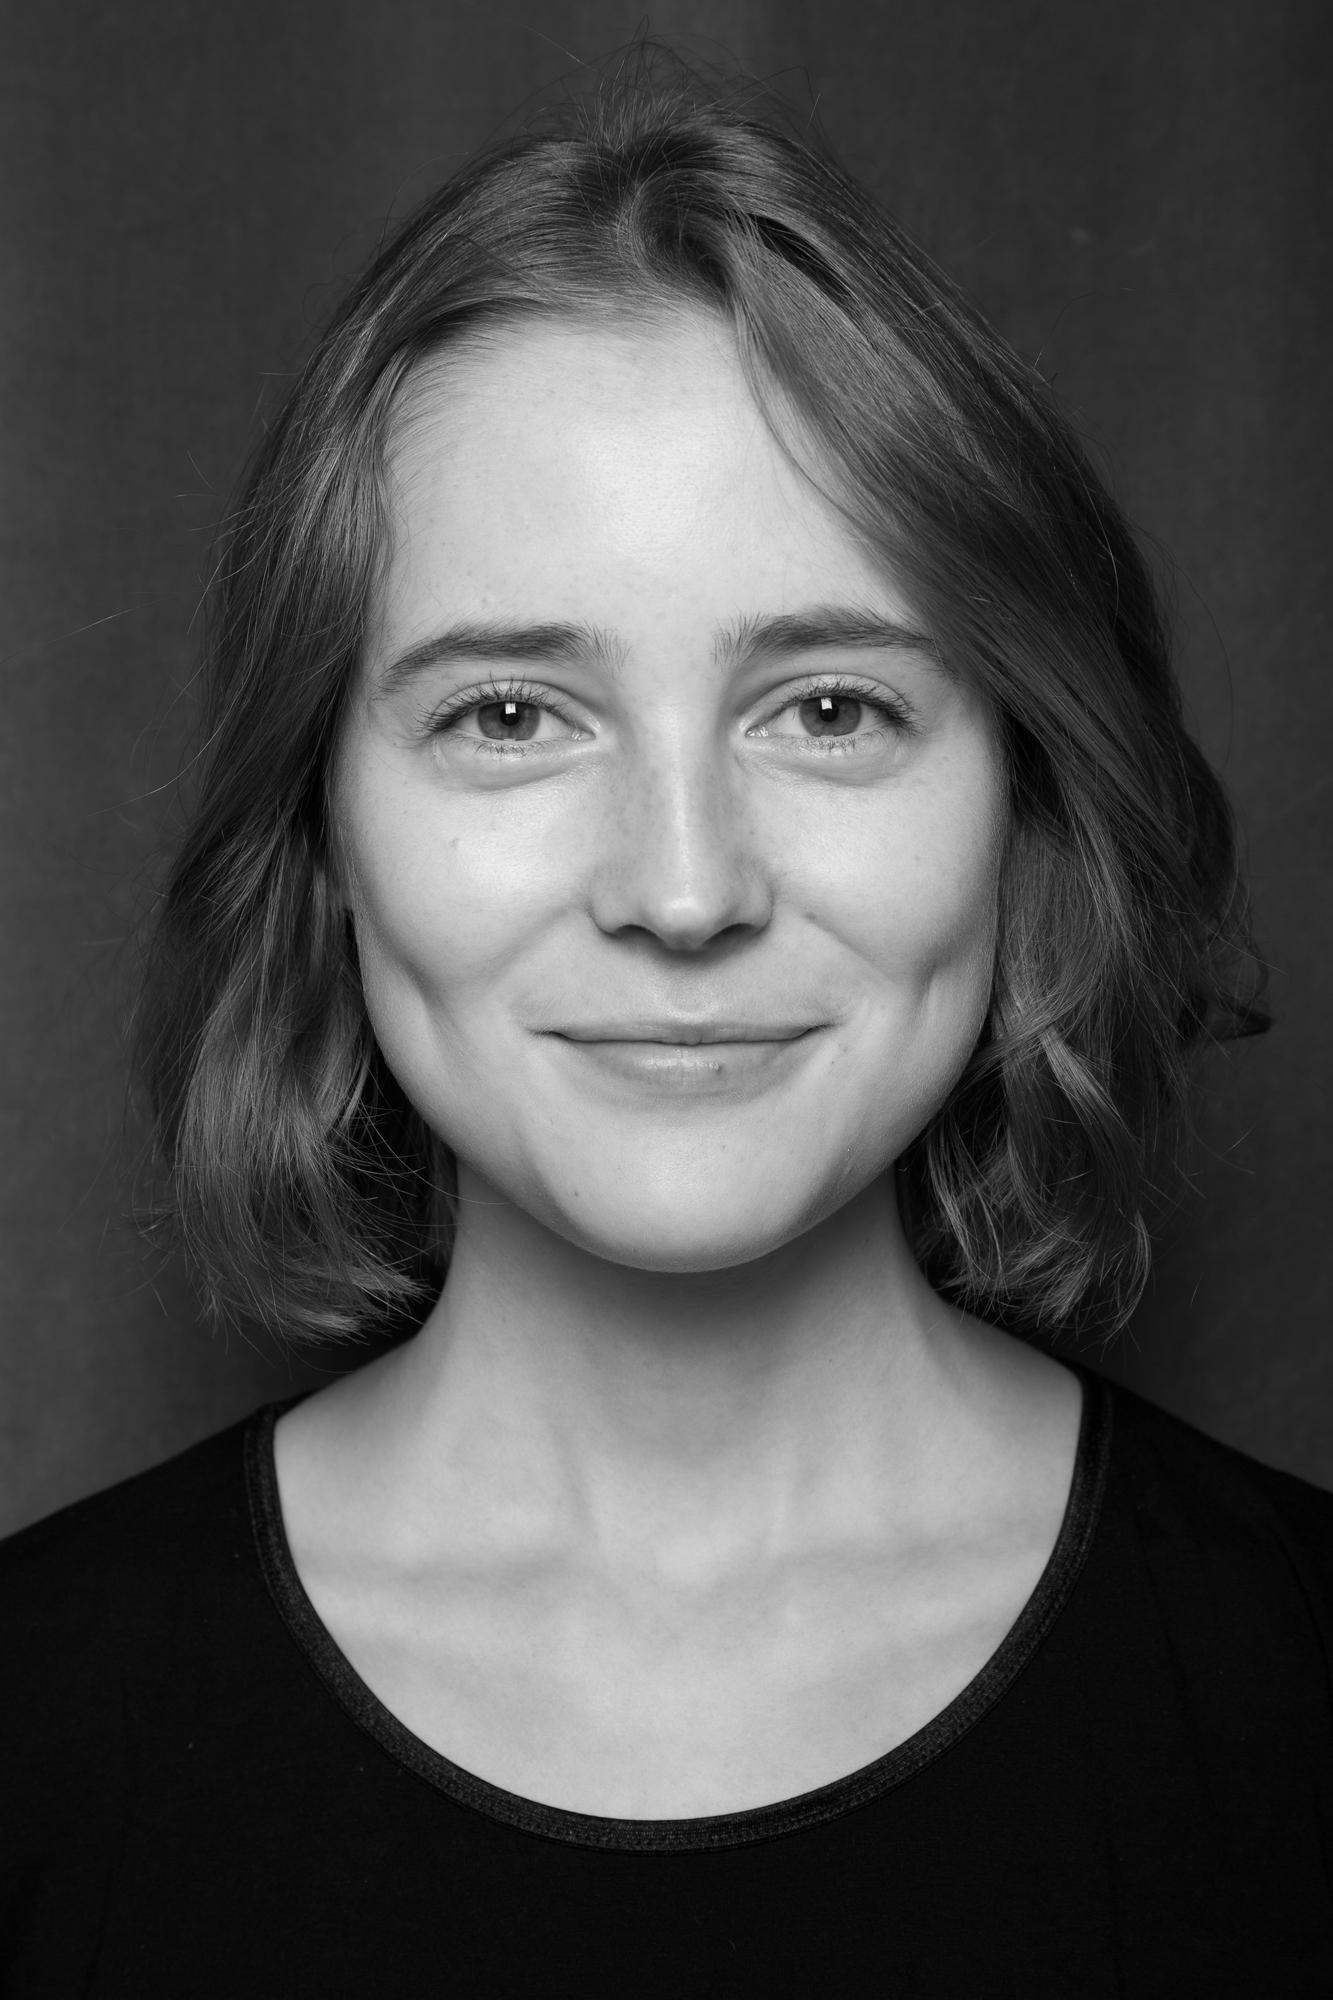 Live Henriette Almvik